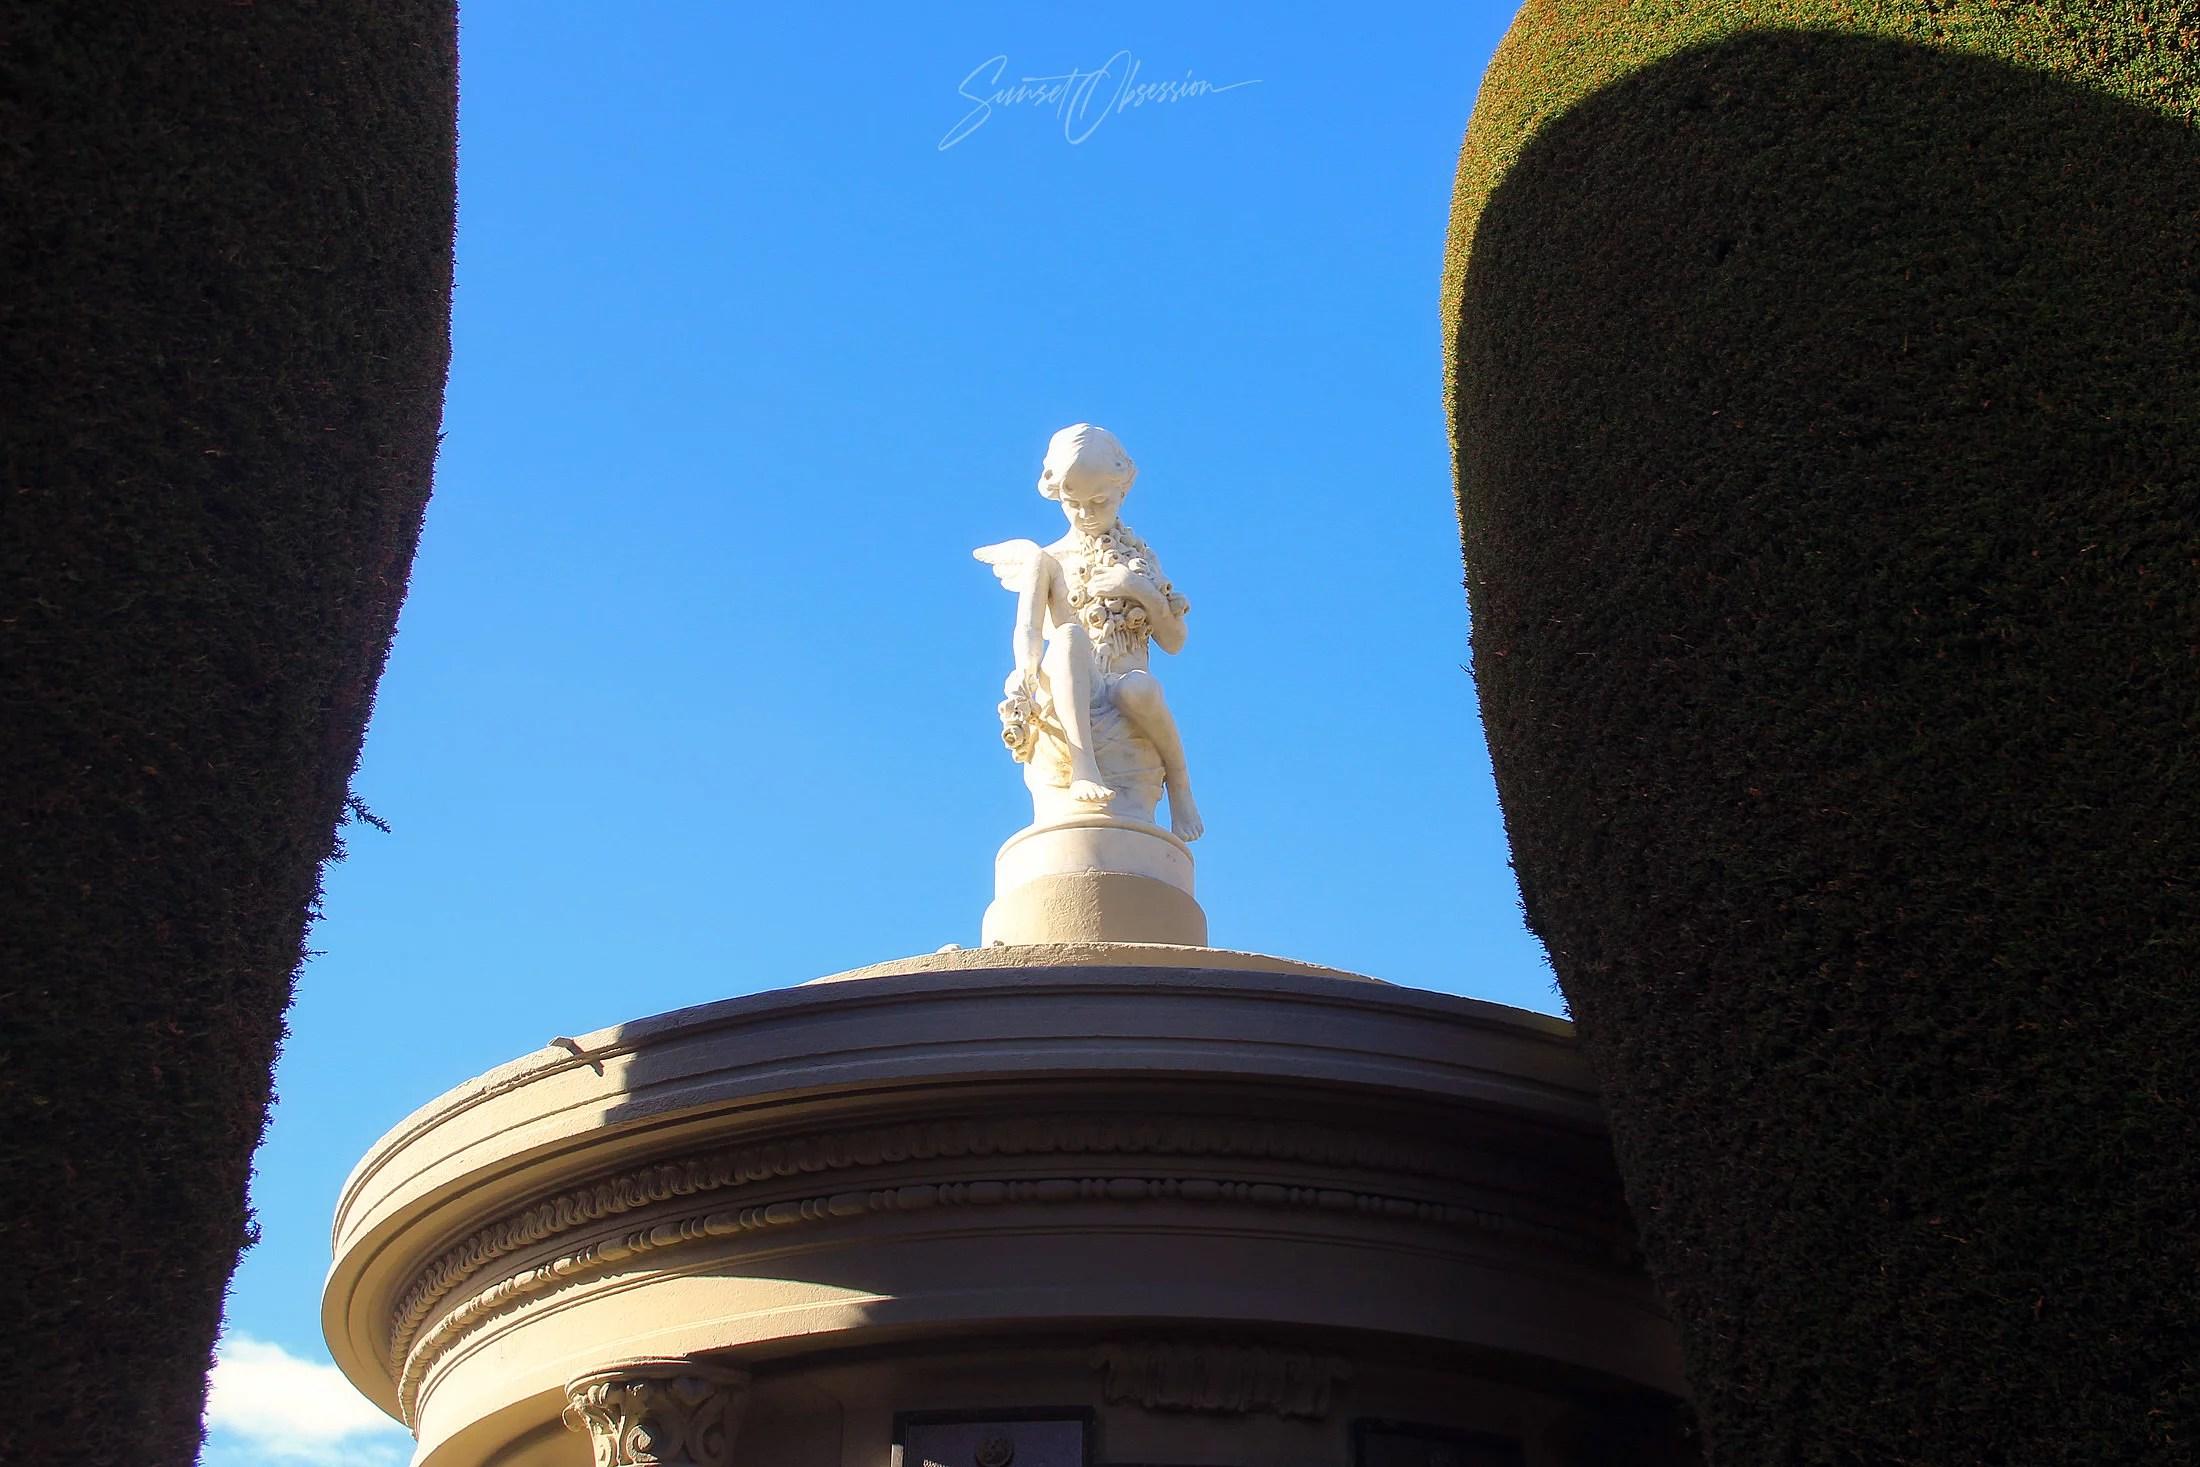 A sculpture on the Sara Braun Cemetery in Punta Arenas